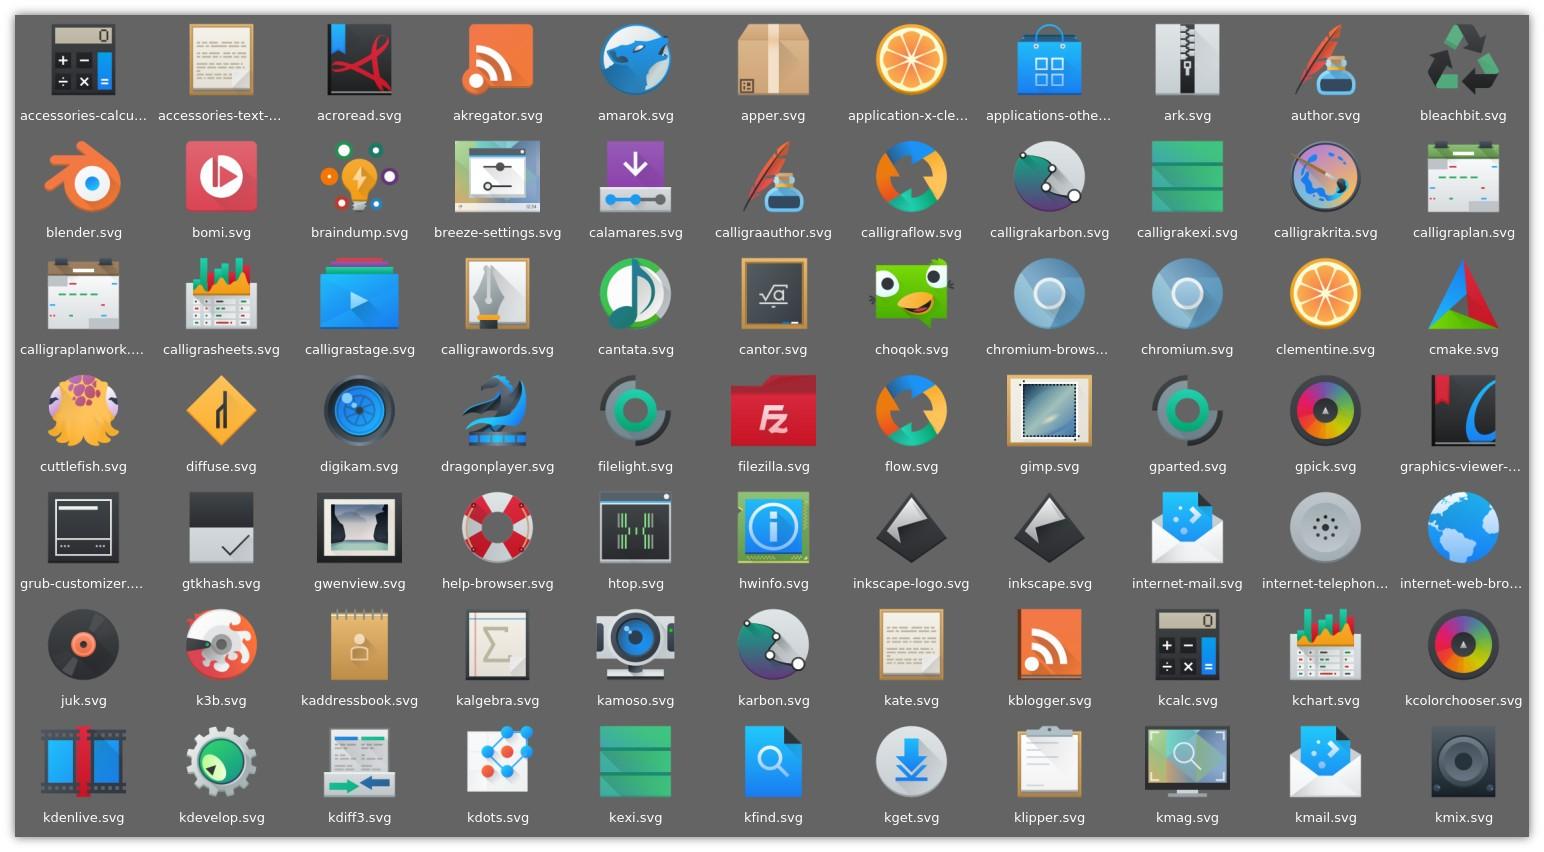 KDE Plasma 5 5 Features New Default Font, Wayland Session